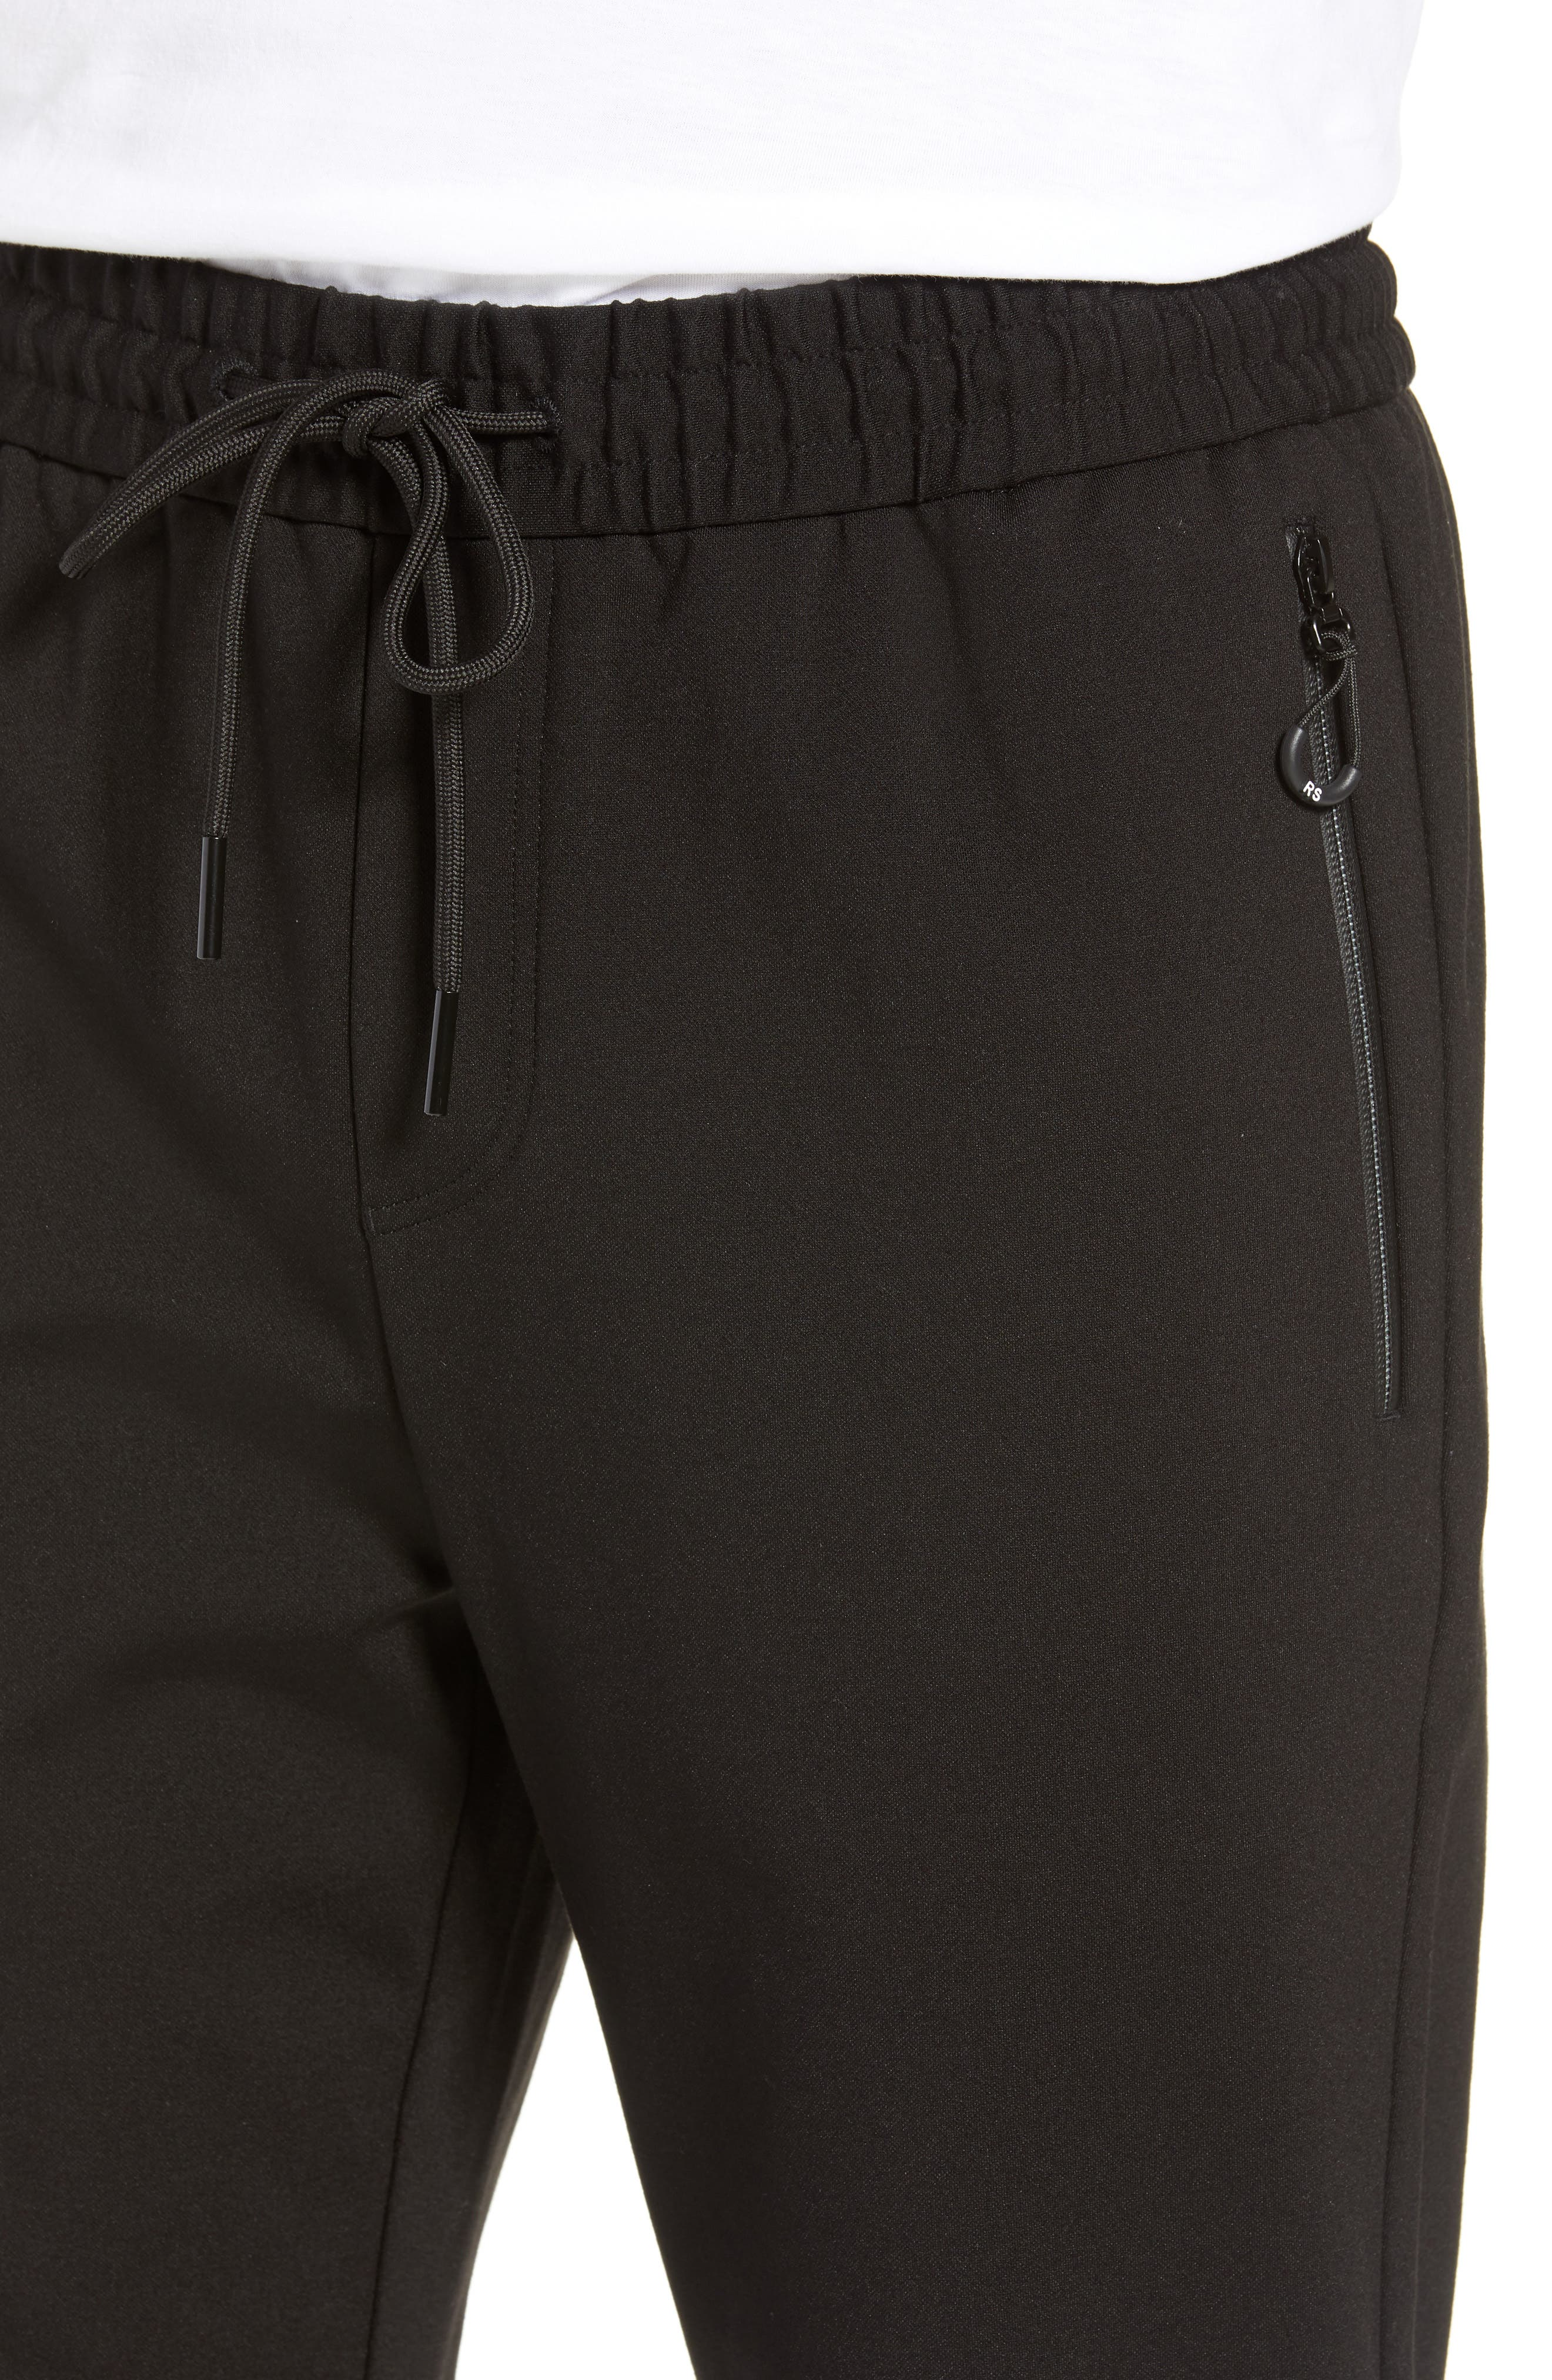 RIVER STONE,                             Slim Fit Pants,                             Alternate thumbnail 4, color,                             001